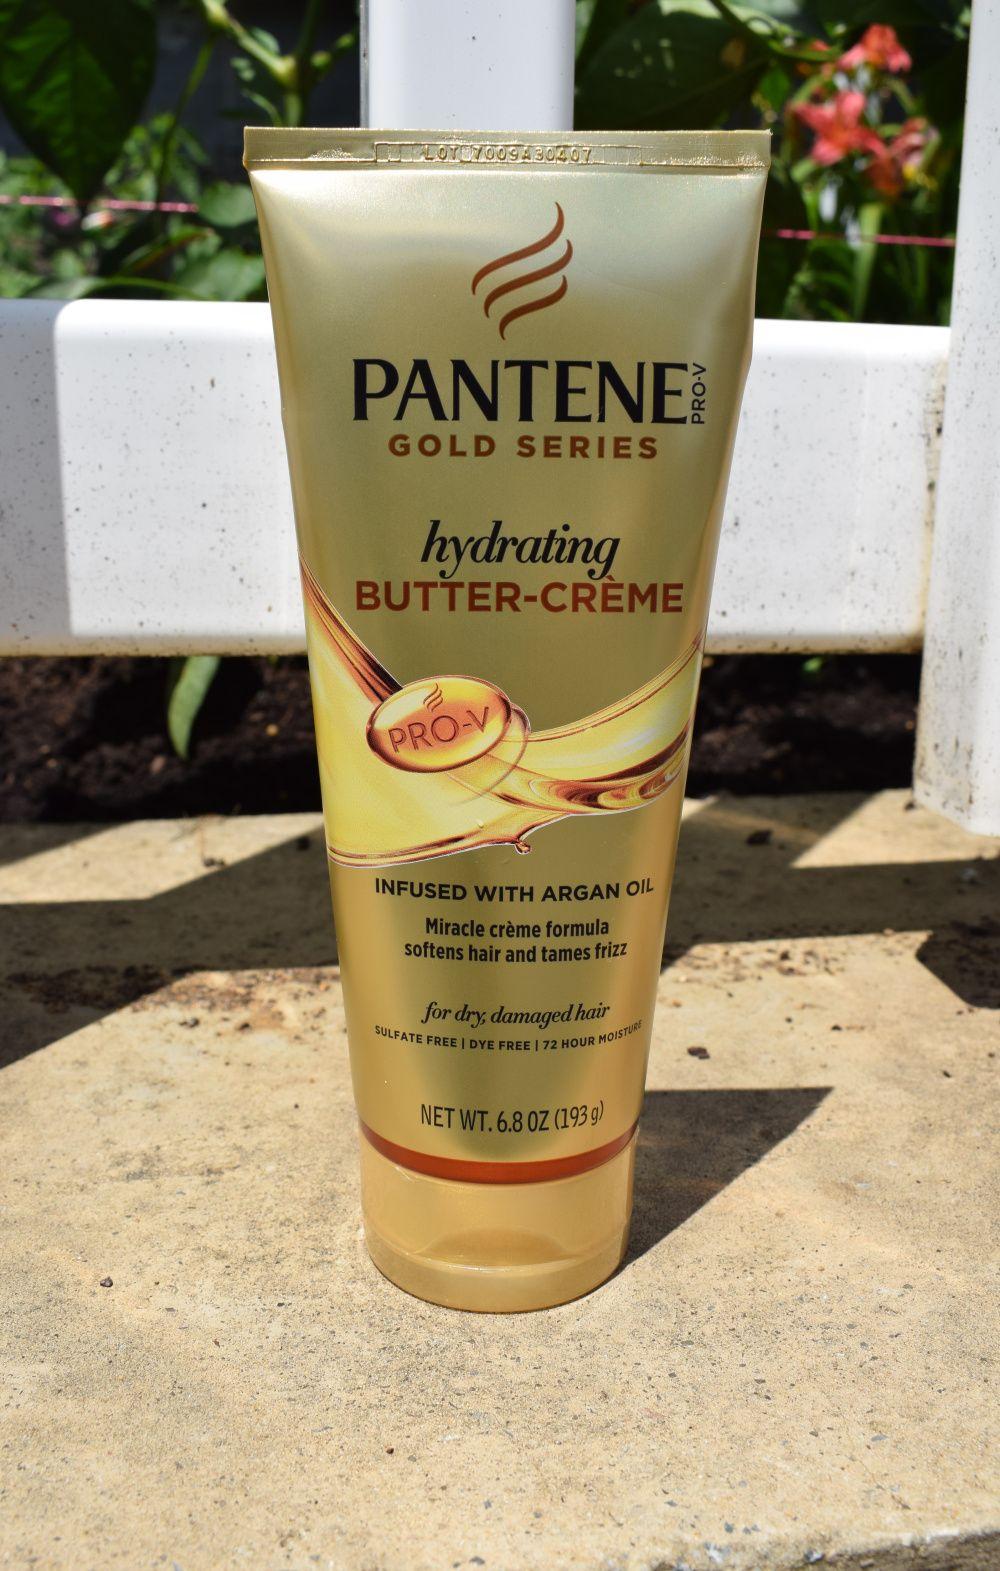 Pantene ProV Gold Series Butter Crème Hair fall control